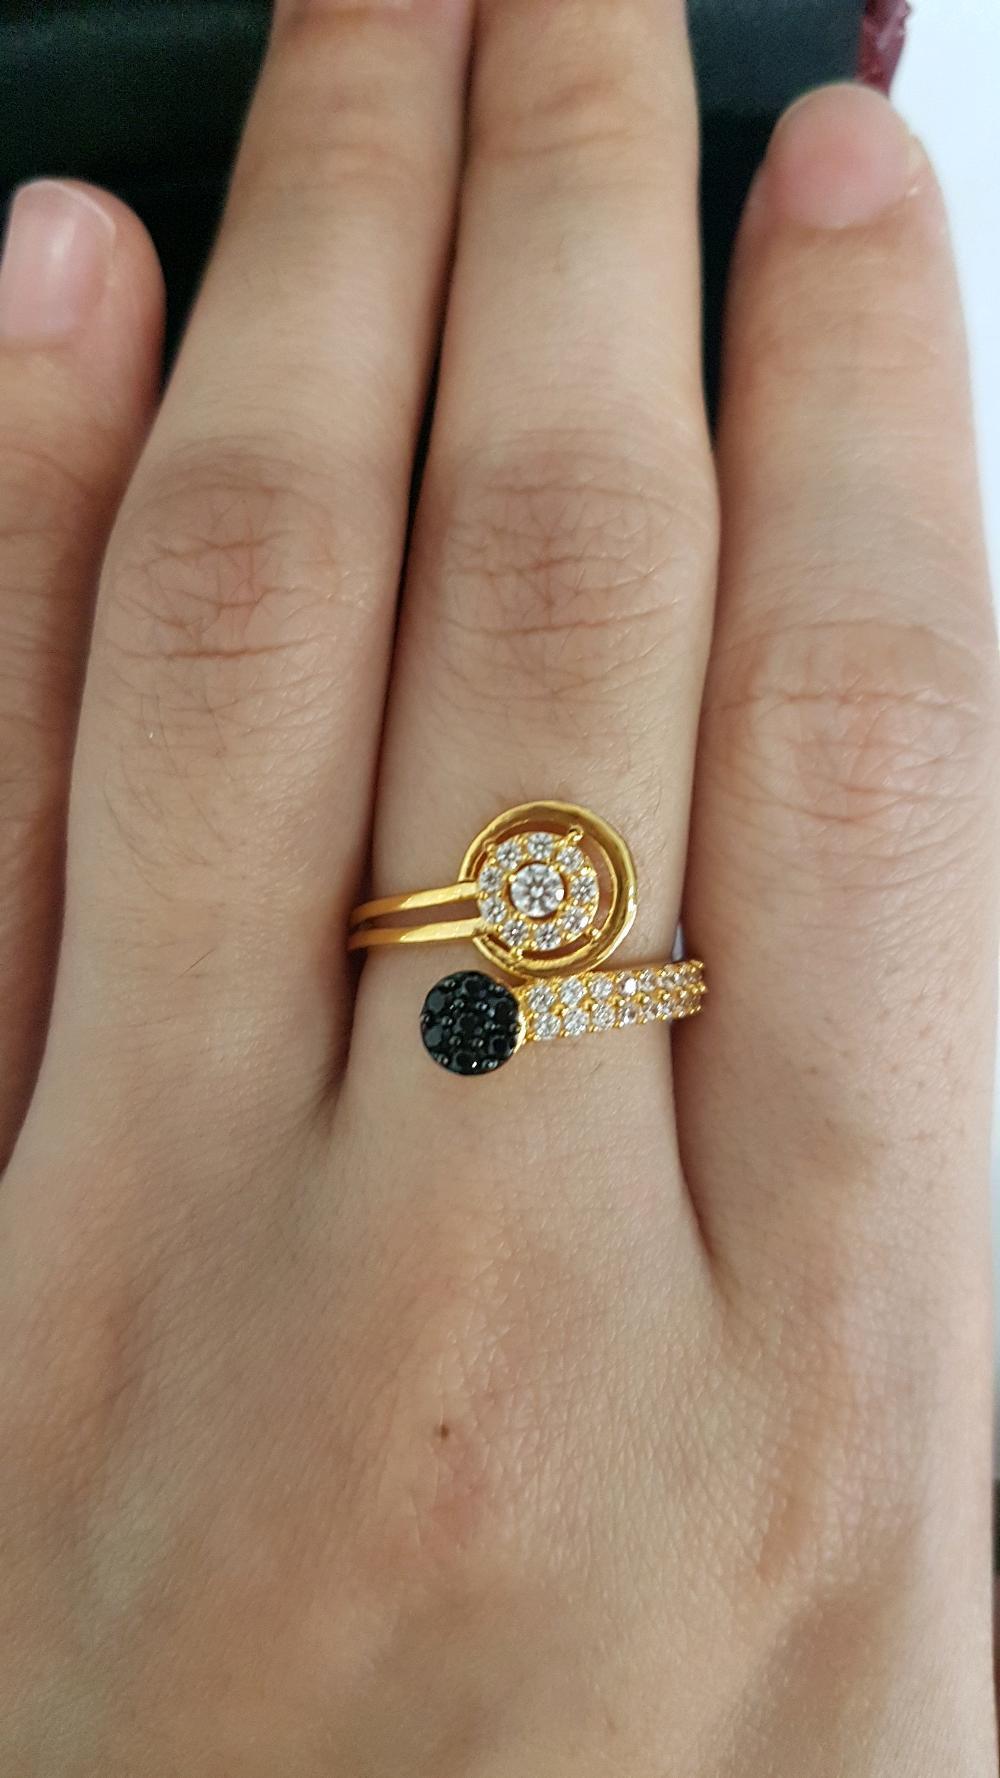 Cincin Emas Asli Kadar 875 Model Permata Hitam Putih Terbaru